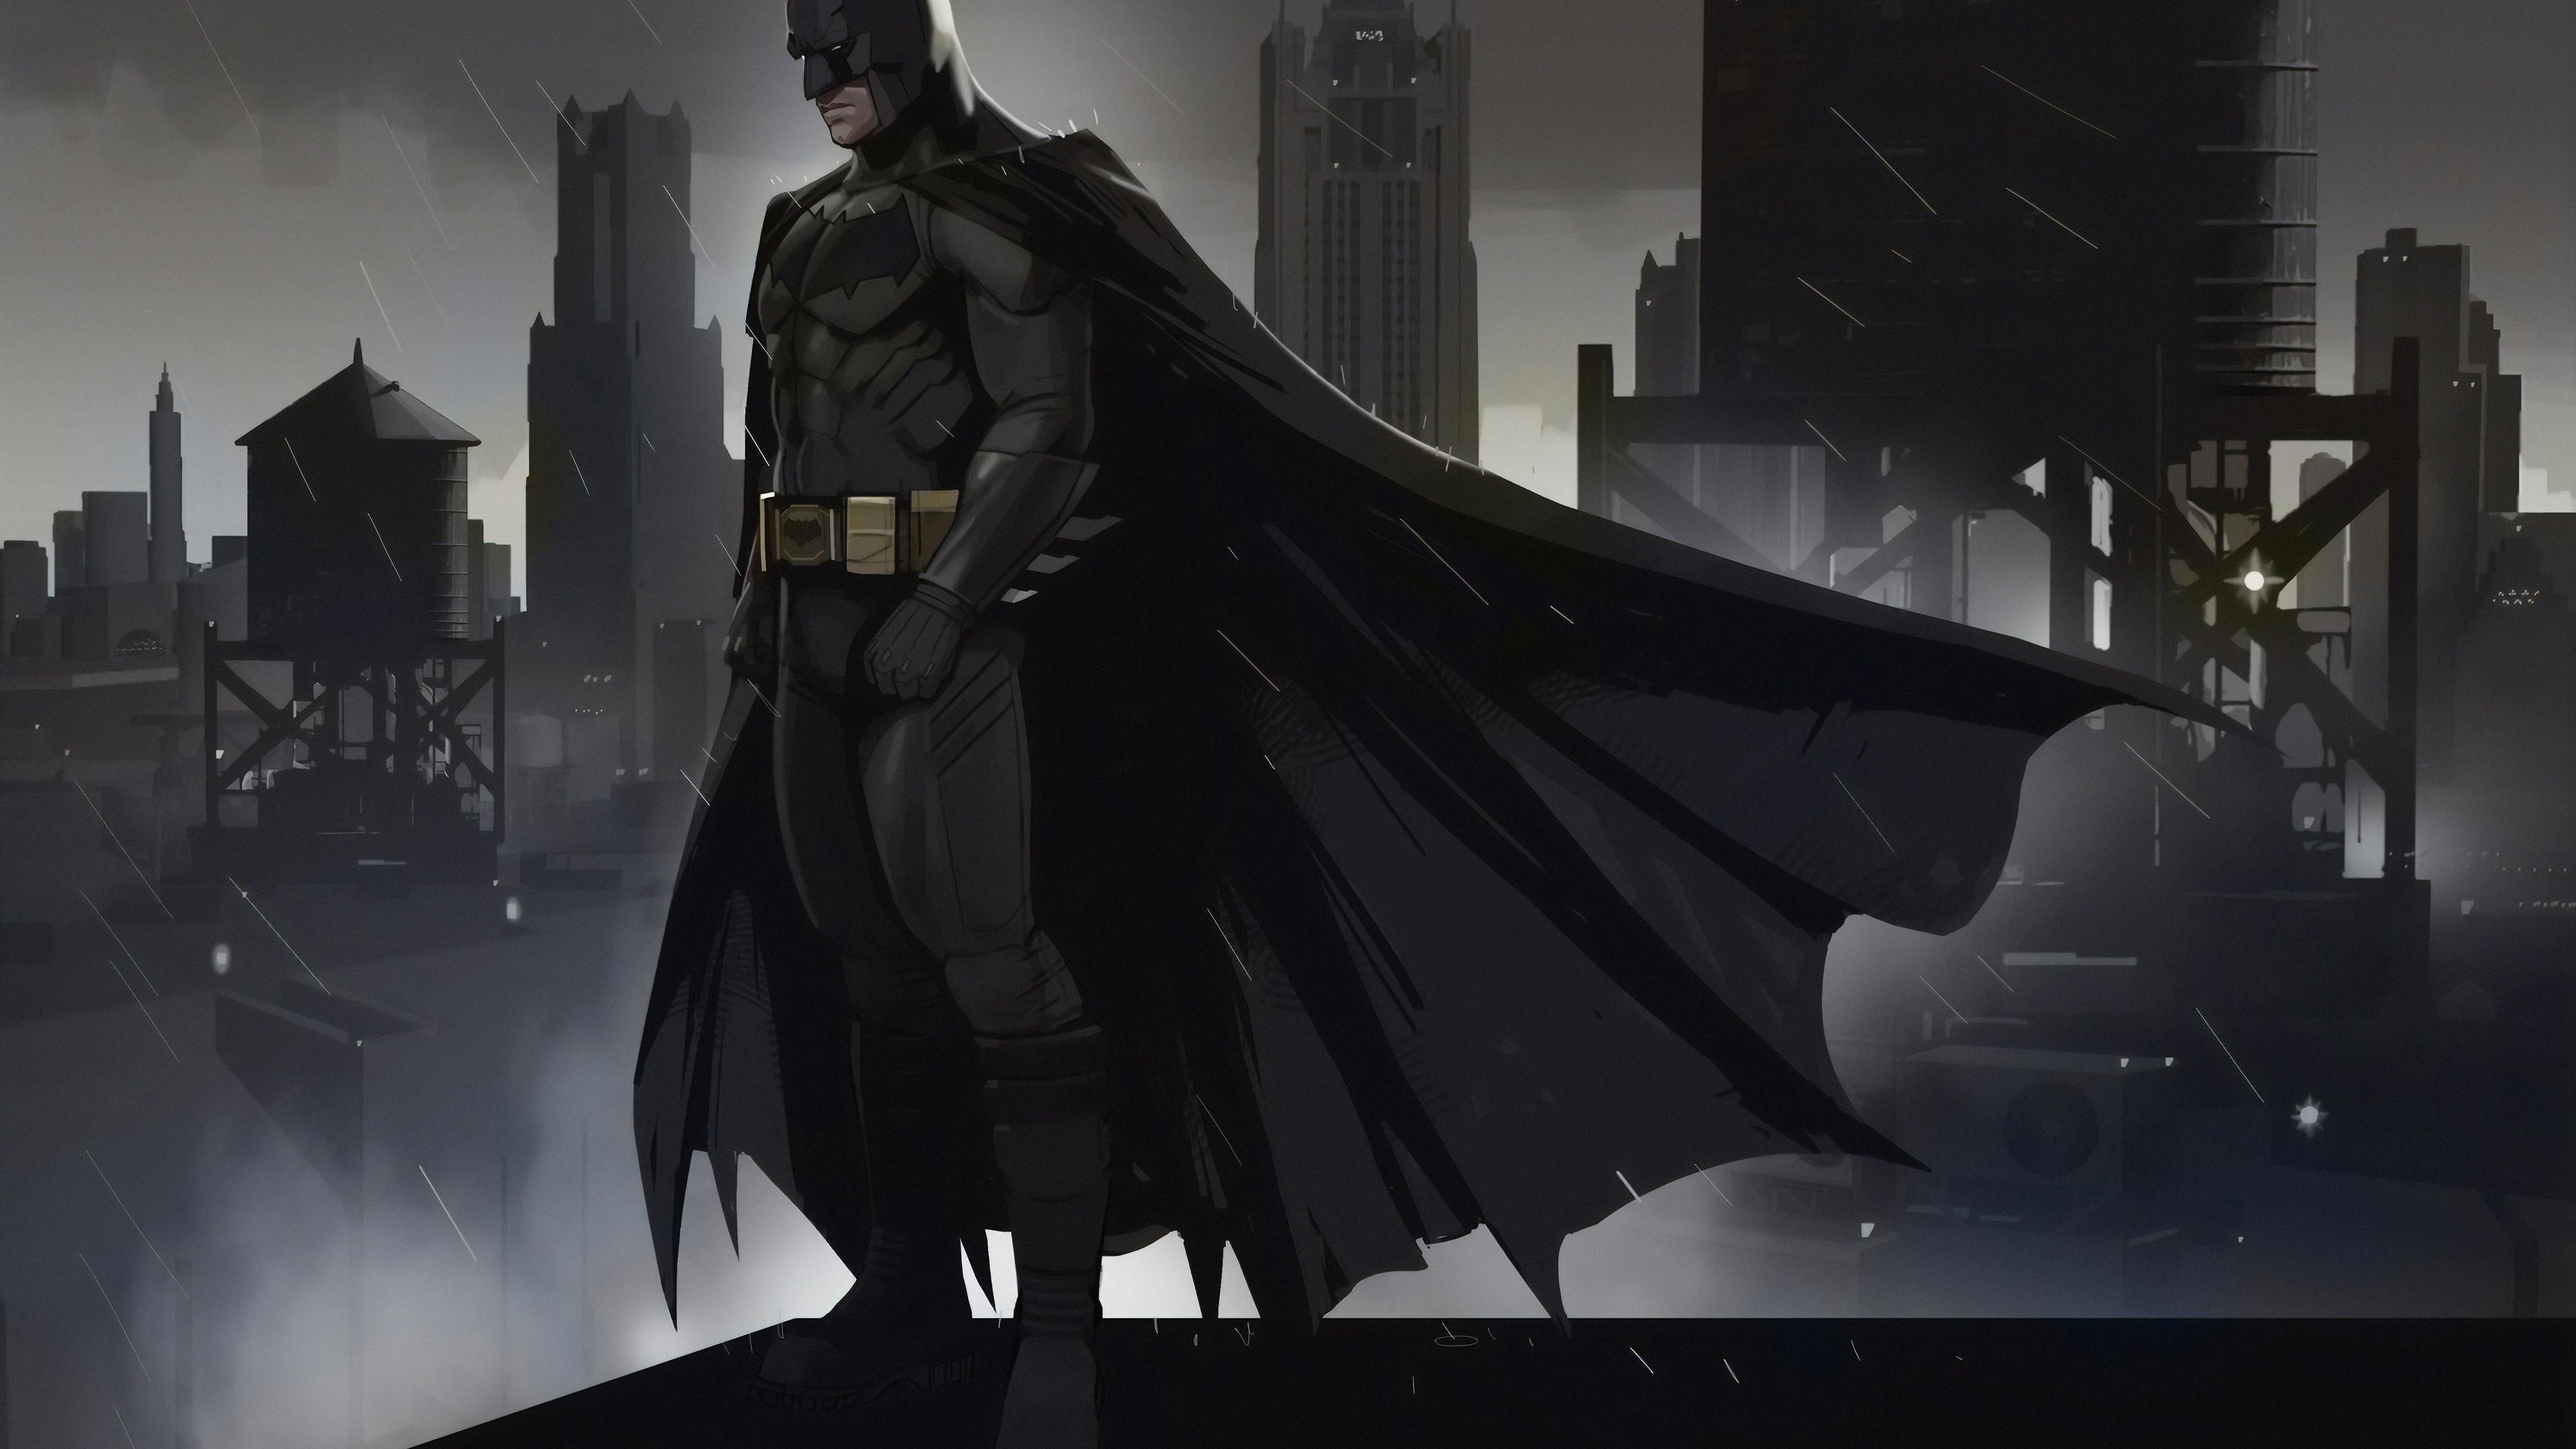 batman knight arts 1568054717 - Batman Knight Arts - superheroes wallpapers, hd-wallpapers, digital art wallpapers, batman wallpapers, artwork wallpapers, artstation wallpapers, 4k-wallpapers